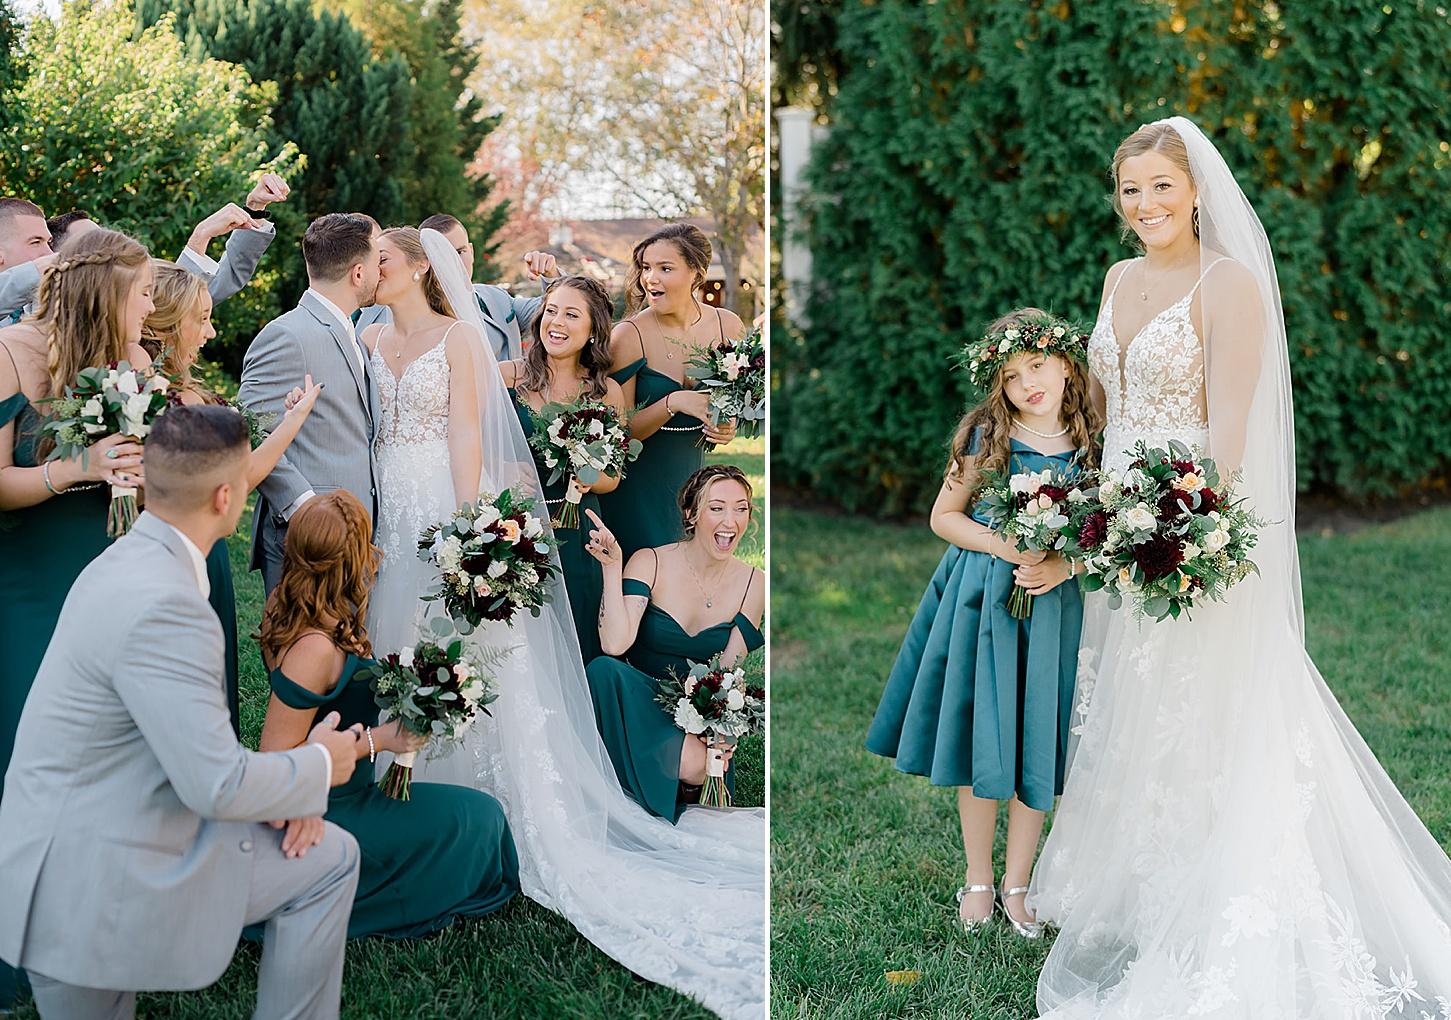 Valenzano Winery Vitners Pavillion Wedding Photography by Magdalena Studios 0017